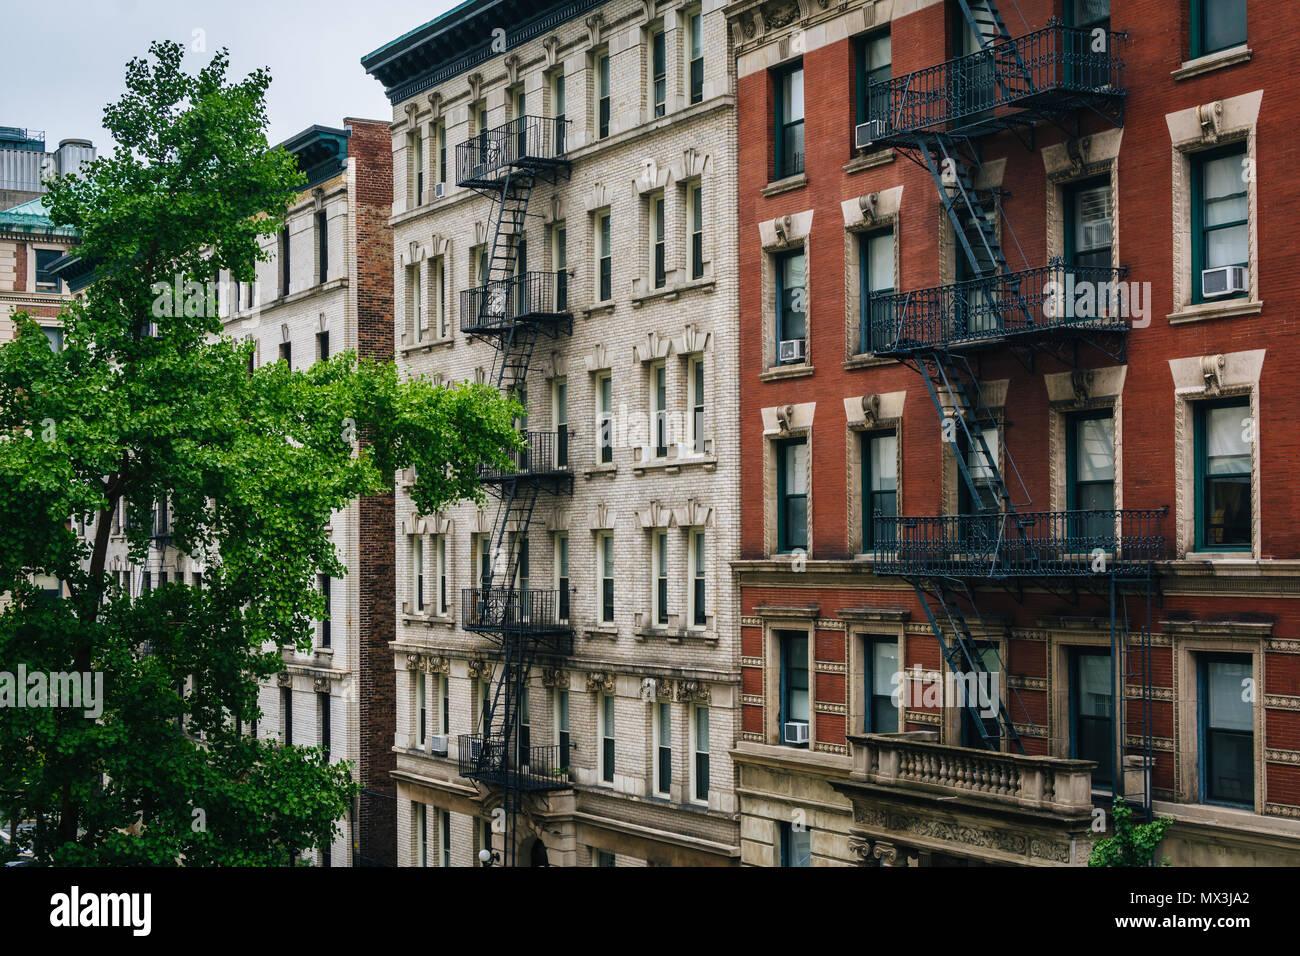 Brick buildings in Morningside Heights, Manhattan, New York City. - Stock Image